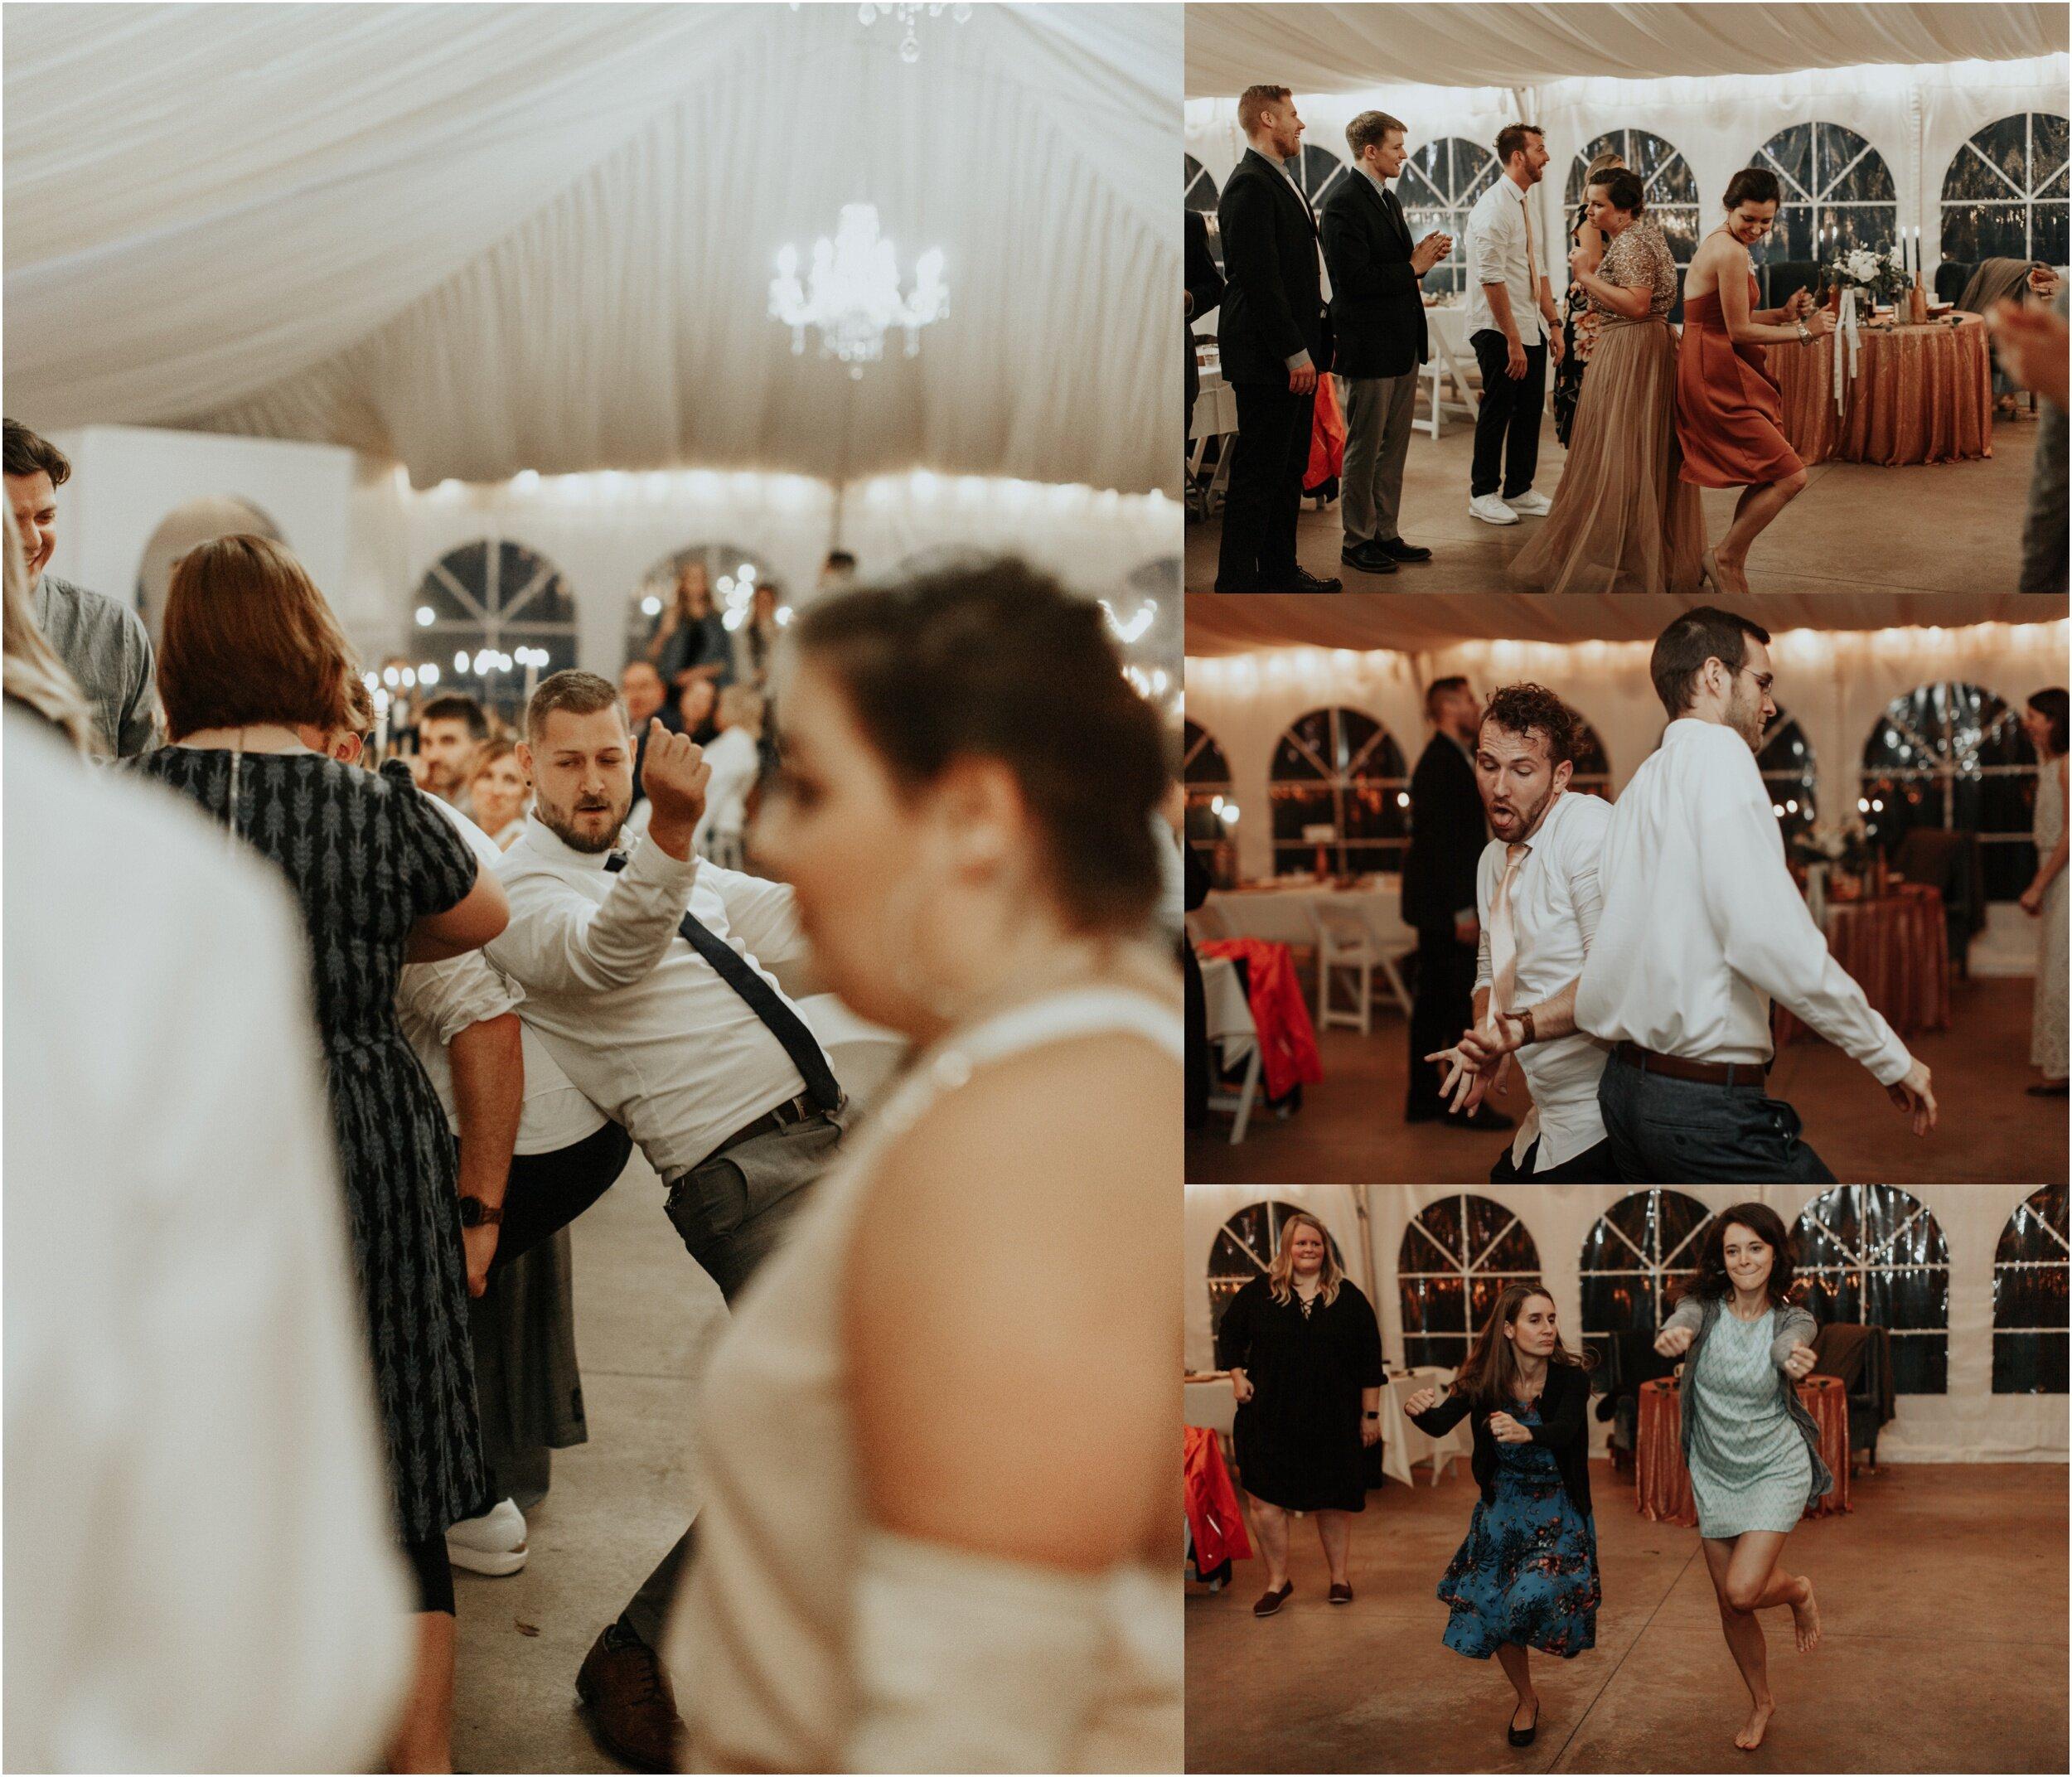 steph-and-jordan-cox-our-wedding-historic-shady-lane-compass-wedding-collective-hazel-lining-photography-destination-elopement-wedding-engagement-photography_0092.jpg